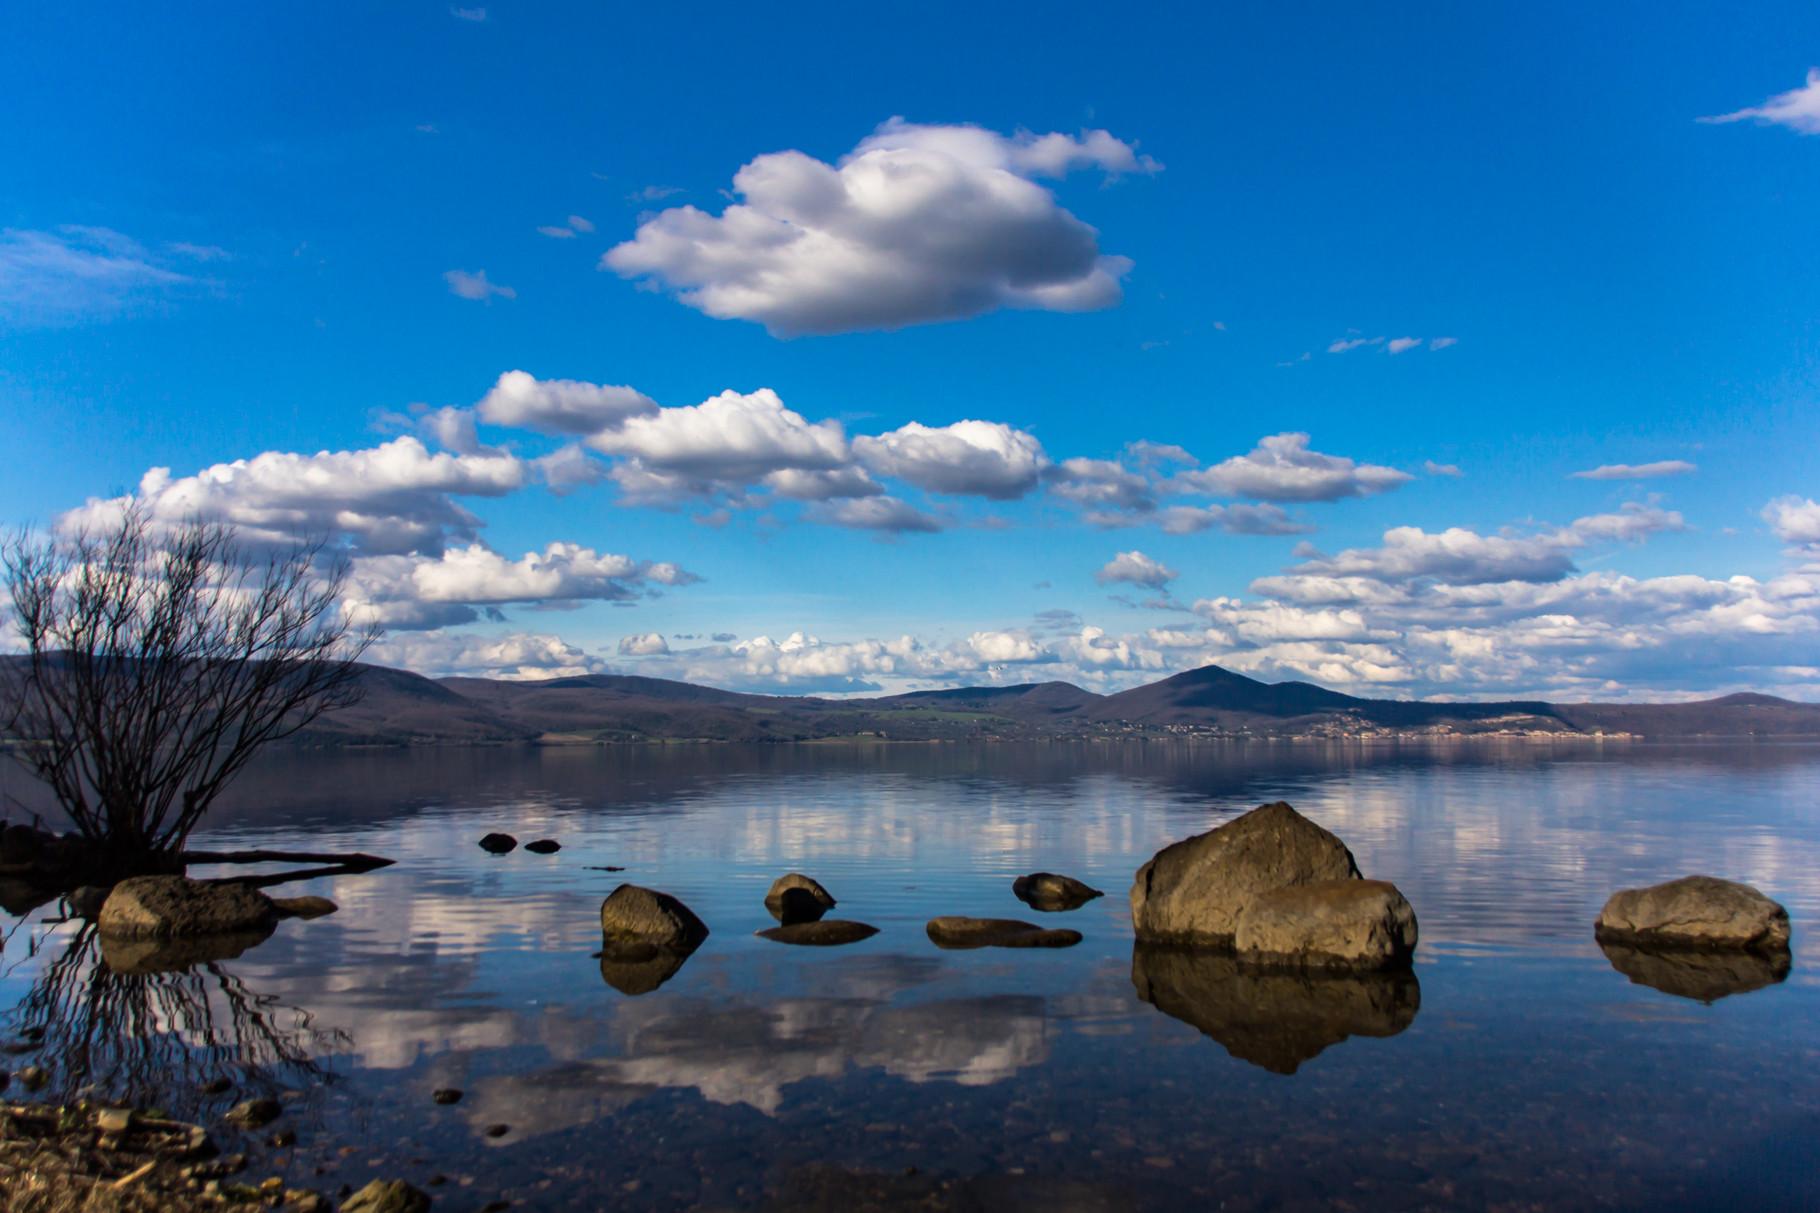 02_Bracciano Lake.